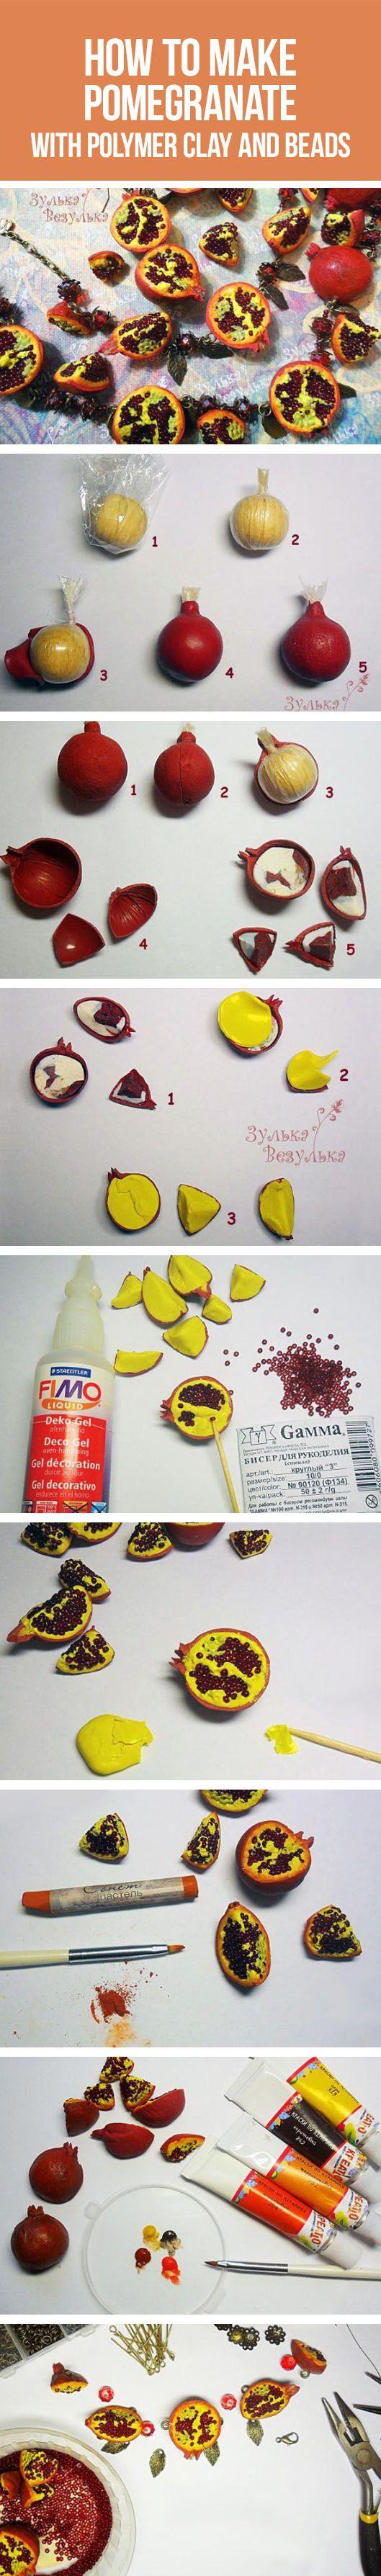 "How to make pomegranate with polymer clay and beads /  ""Гранатовое"" украшение из полимерной глины и бисера"